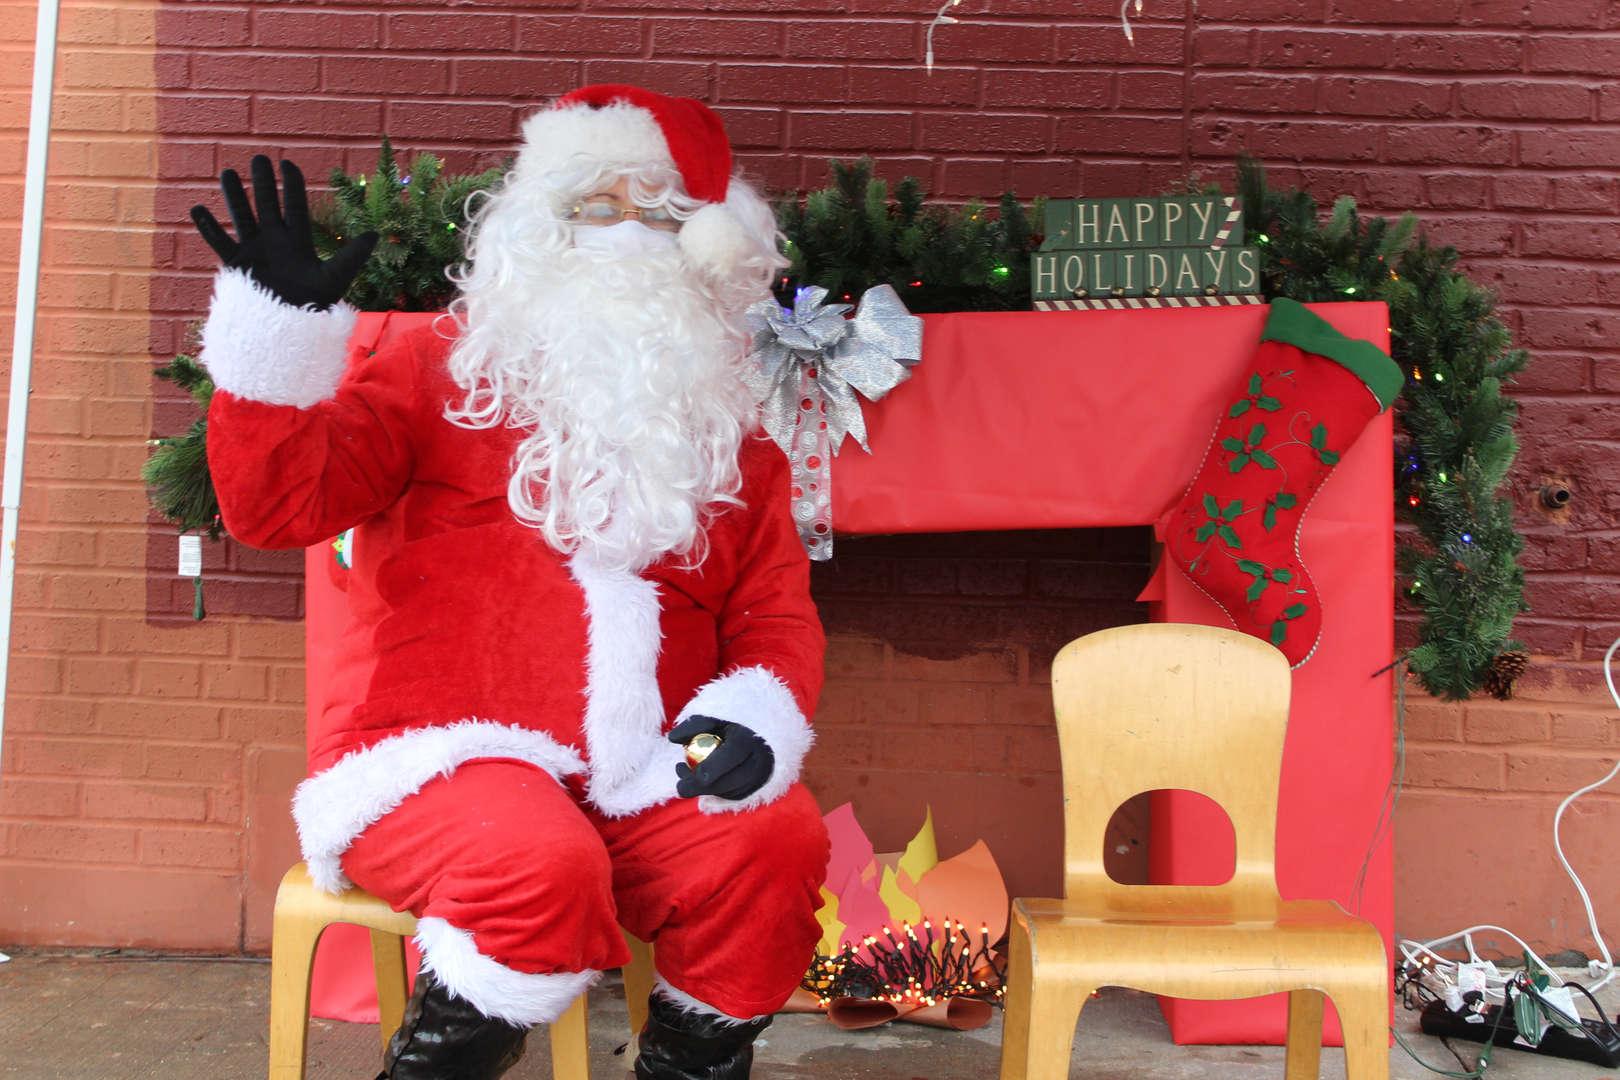 Santa sitting behind a fireplace.